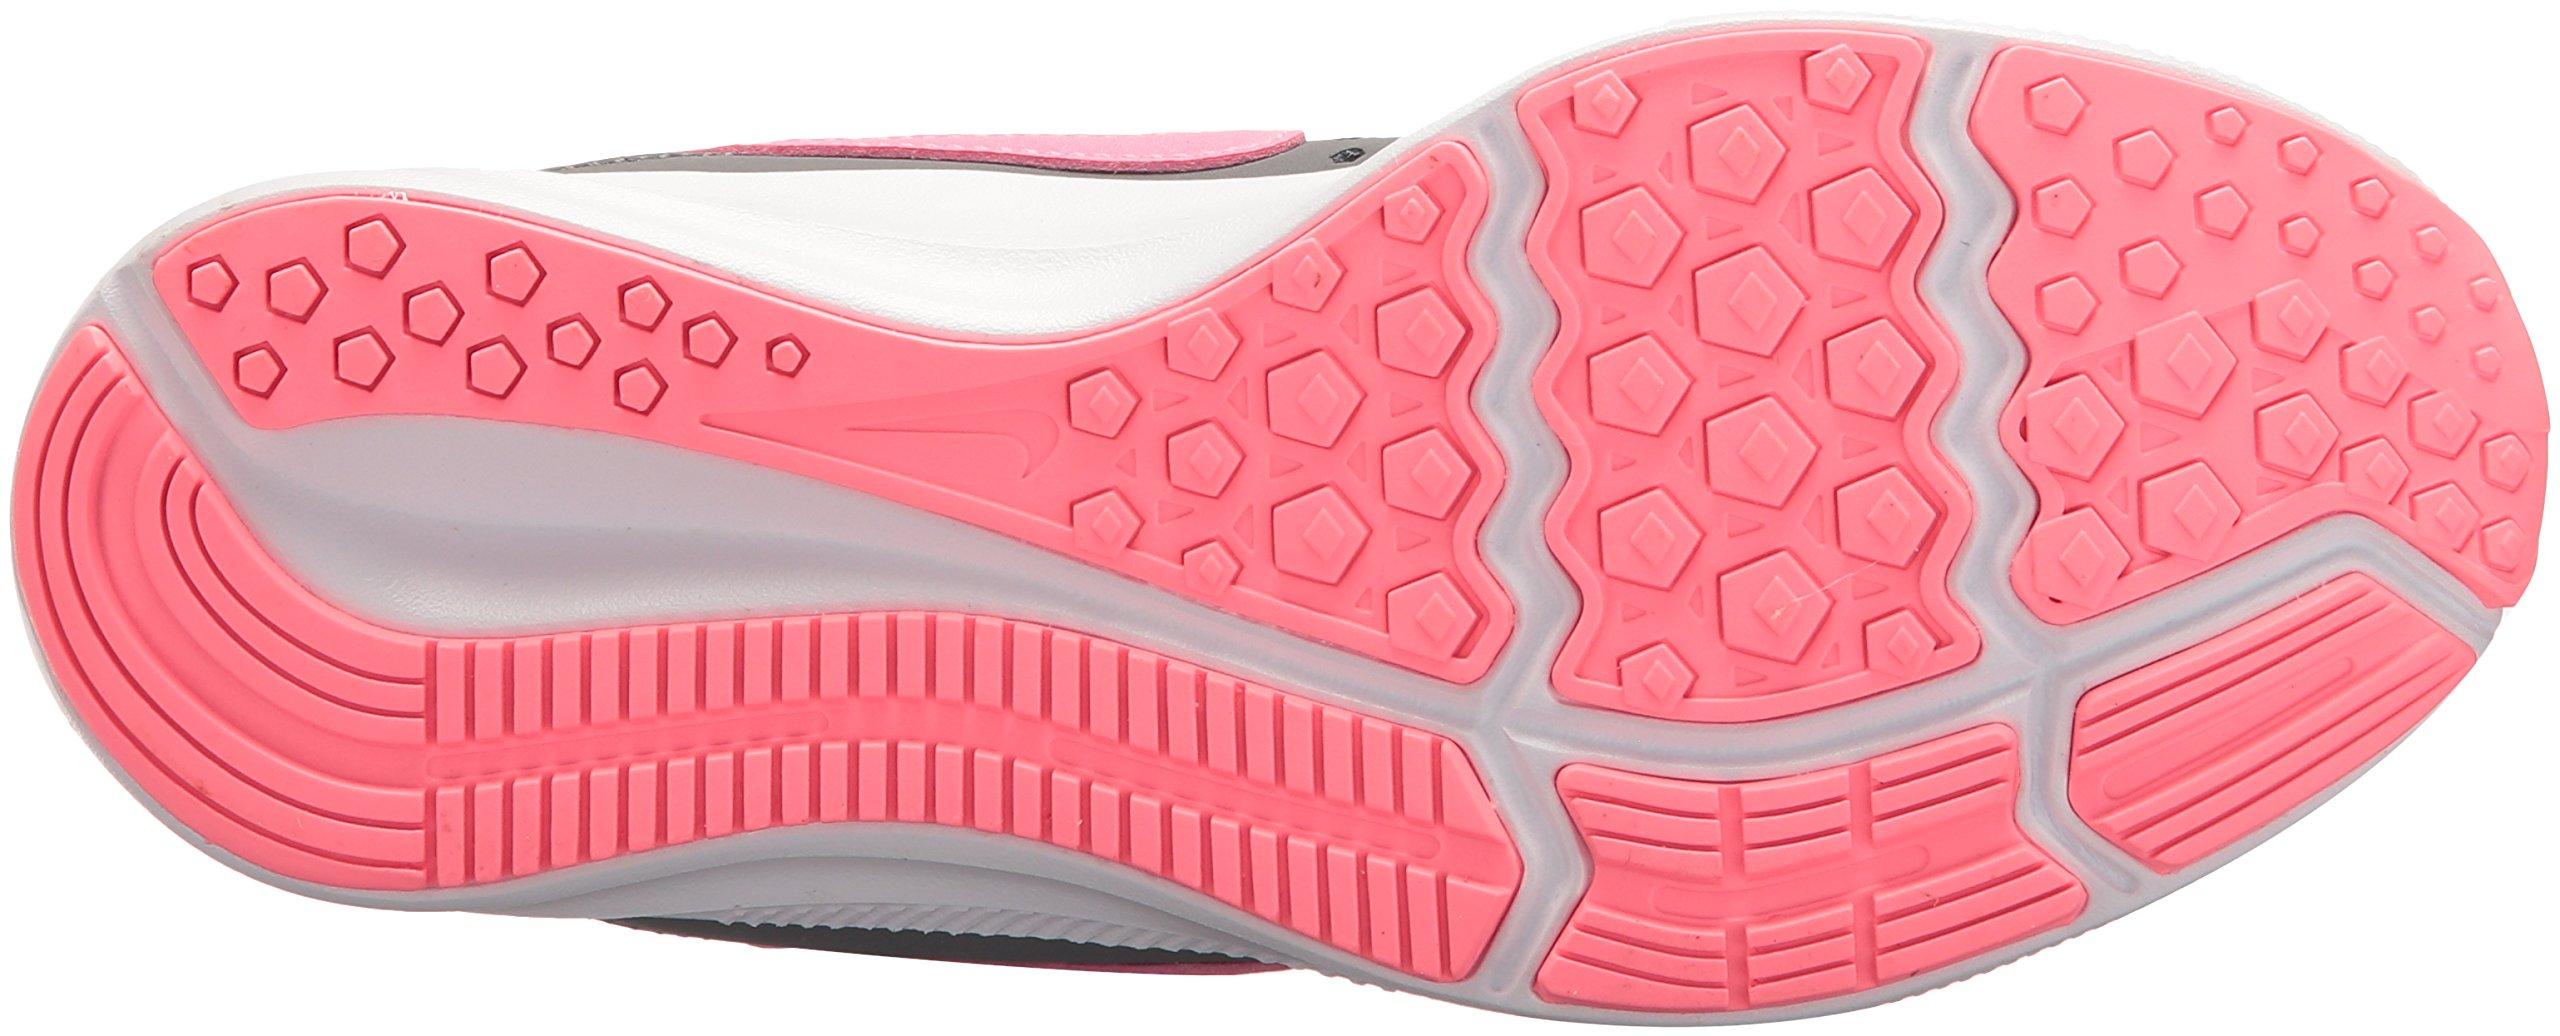 Nike Girls' Downshifter 7 (PSV) Running Shoe, Gunsmoke/Sunset Pulse-Atmosphere Grey, 2 M US Little Kid by Nike (Image #3)